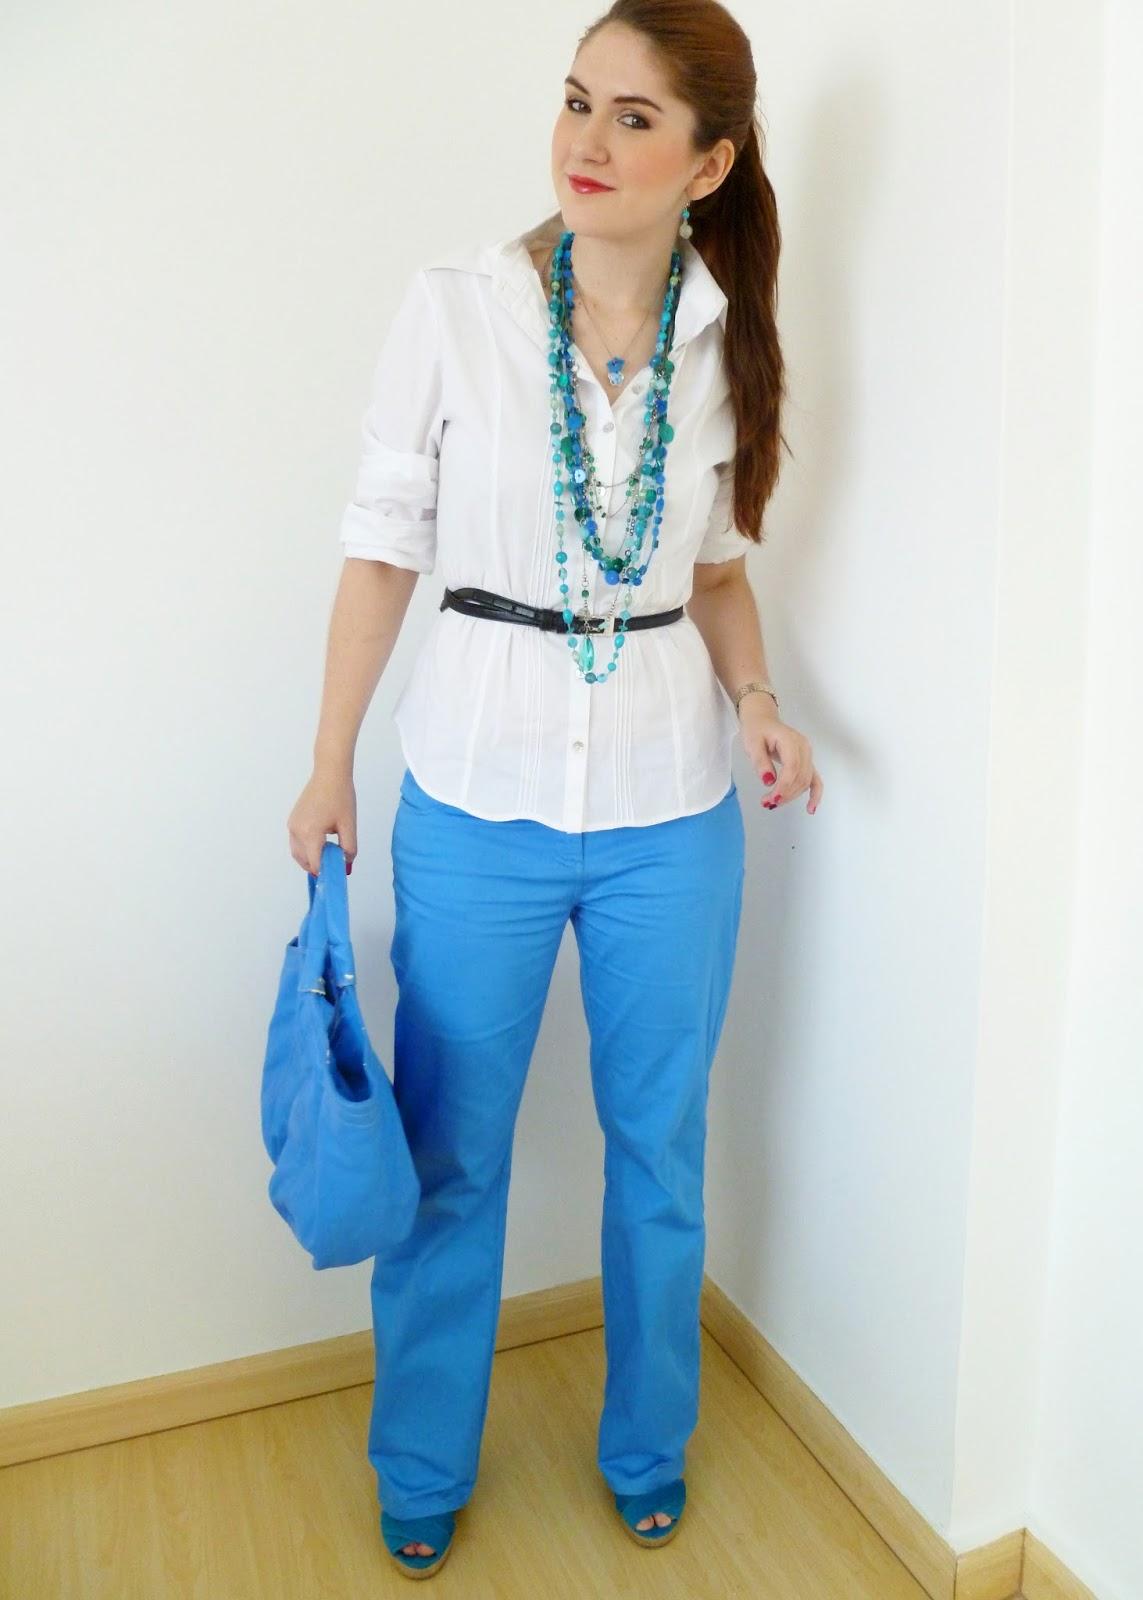 Blue Pants Outfit